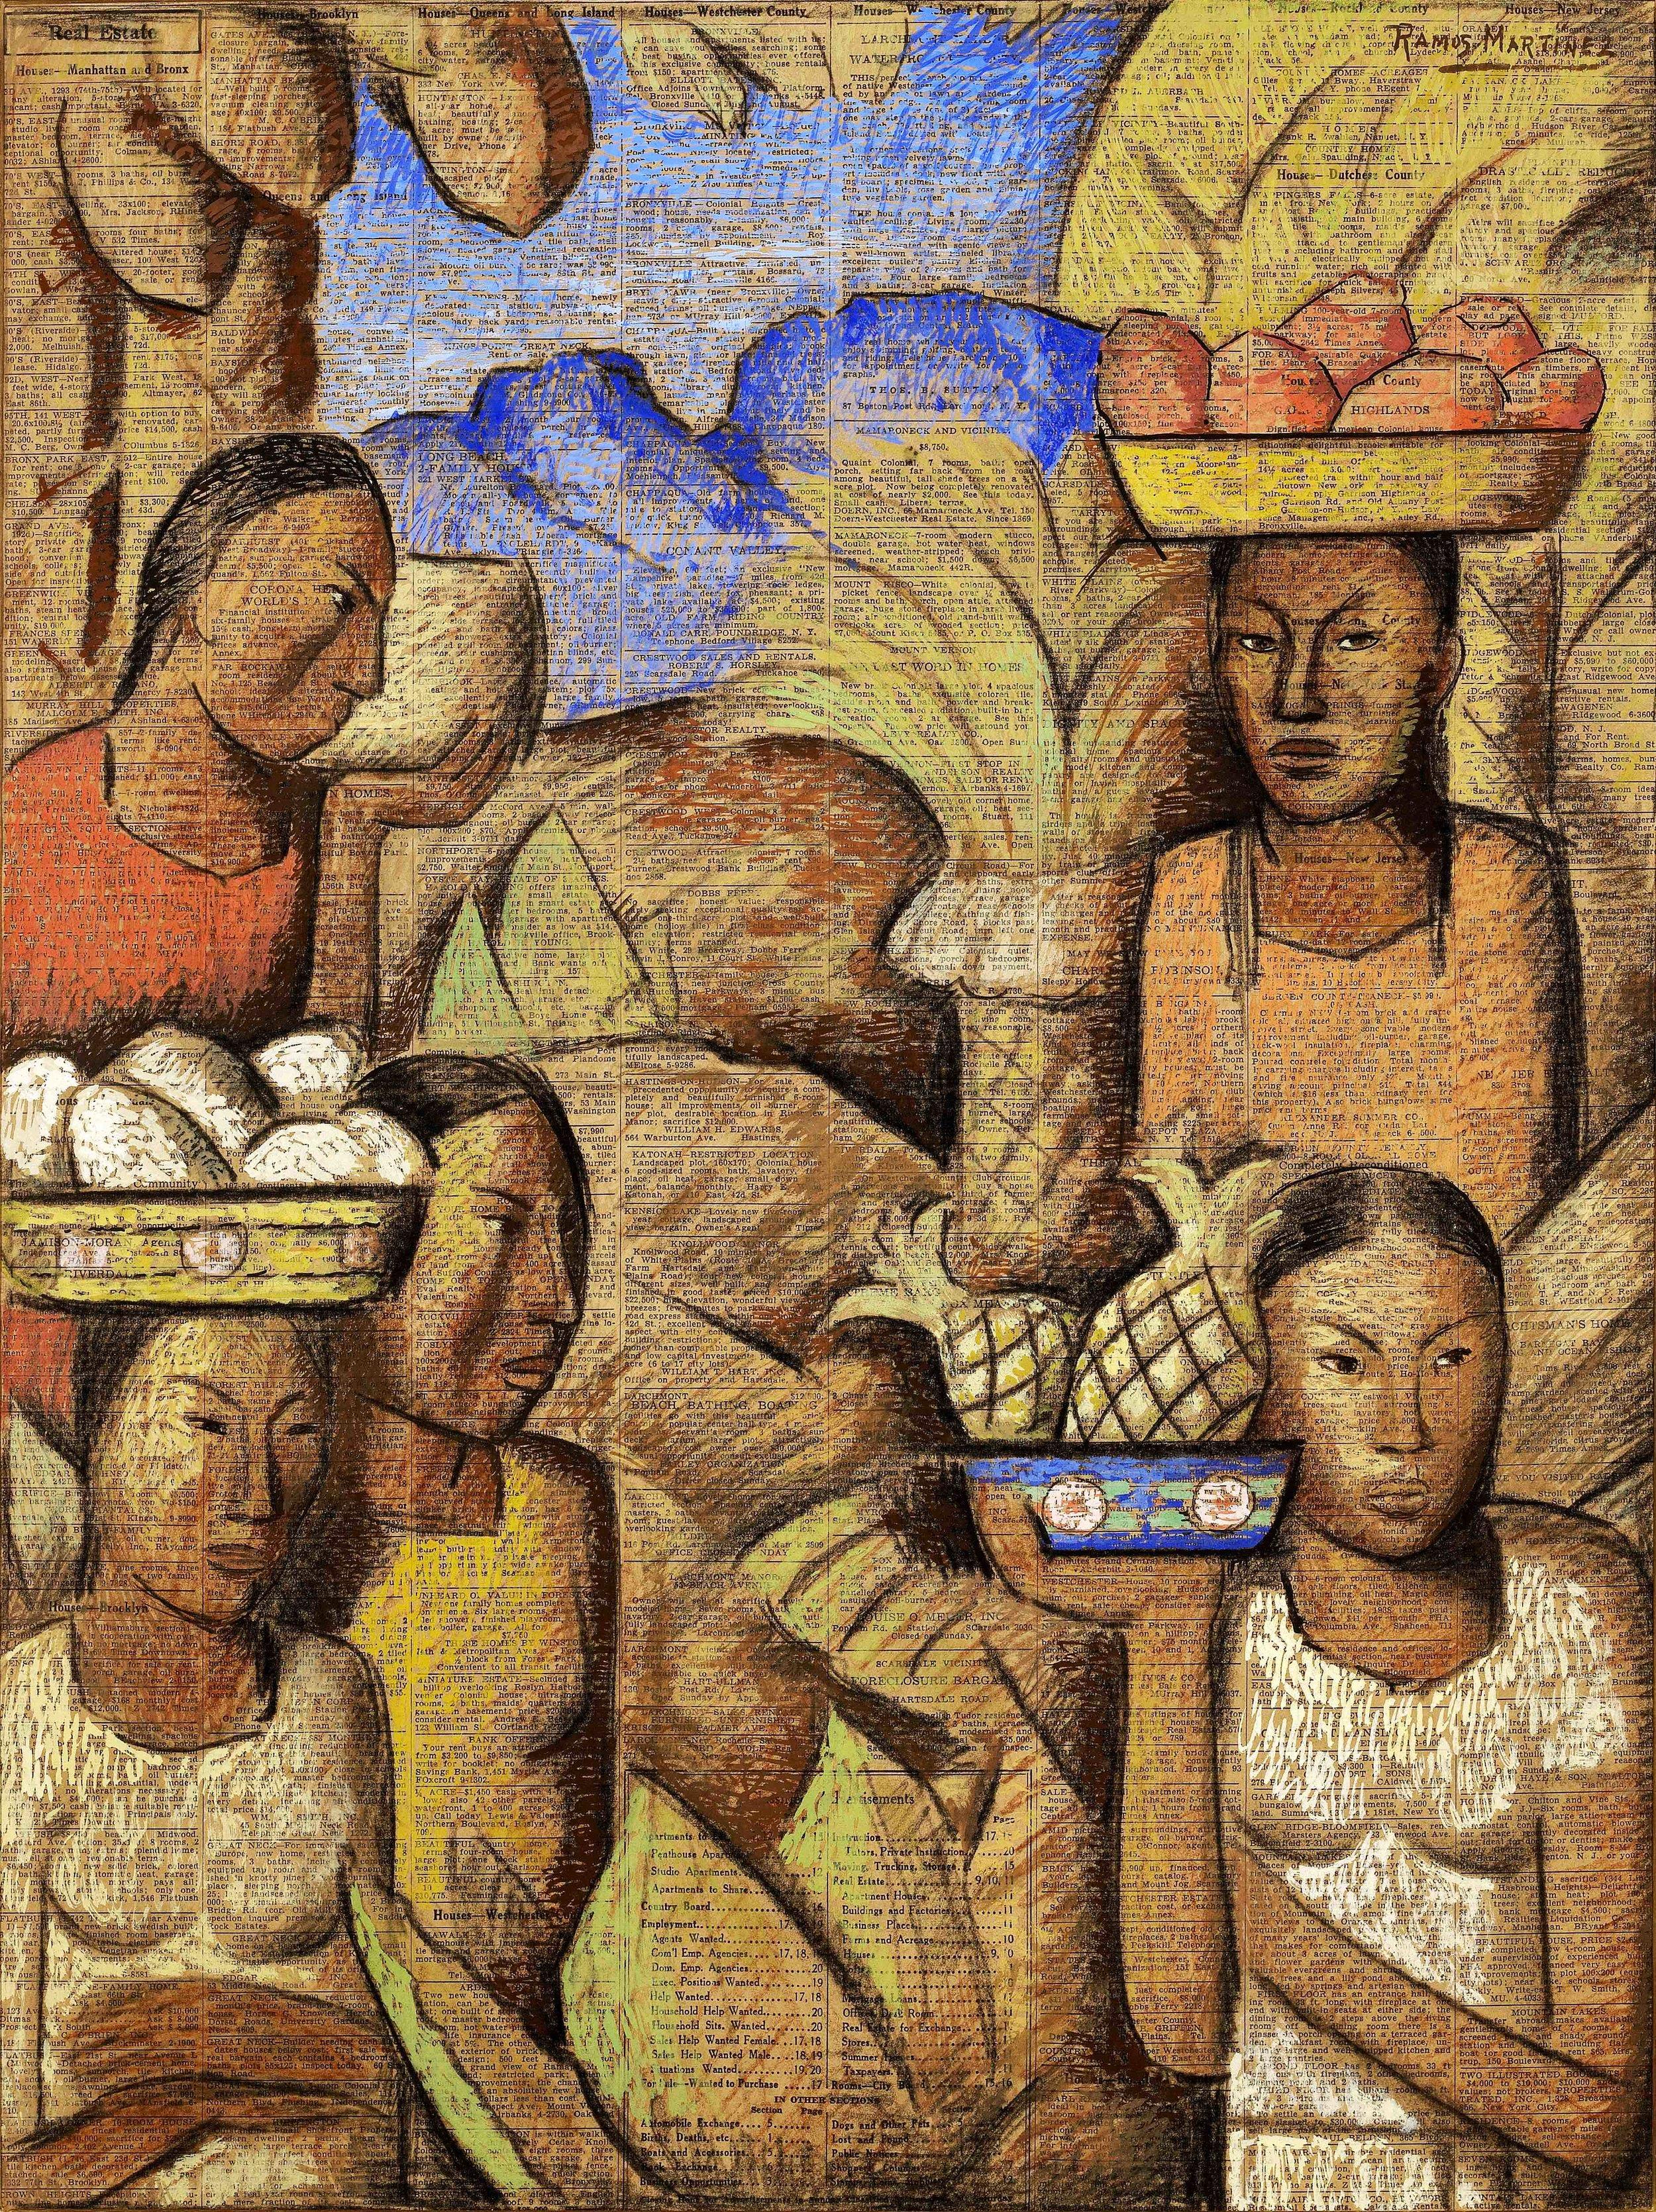 Vendedoras de Frutas / Fruit Vendors  ca. 1938 tempera and charcoal on newsprint / temple y carbón sobre papel periódico ( New York Times , July 17, 1938) 21 x 16 inches; 53.3 x 40.6 centímetros Private collection